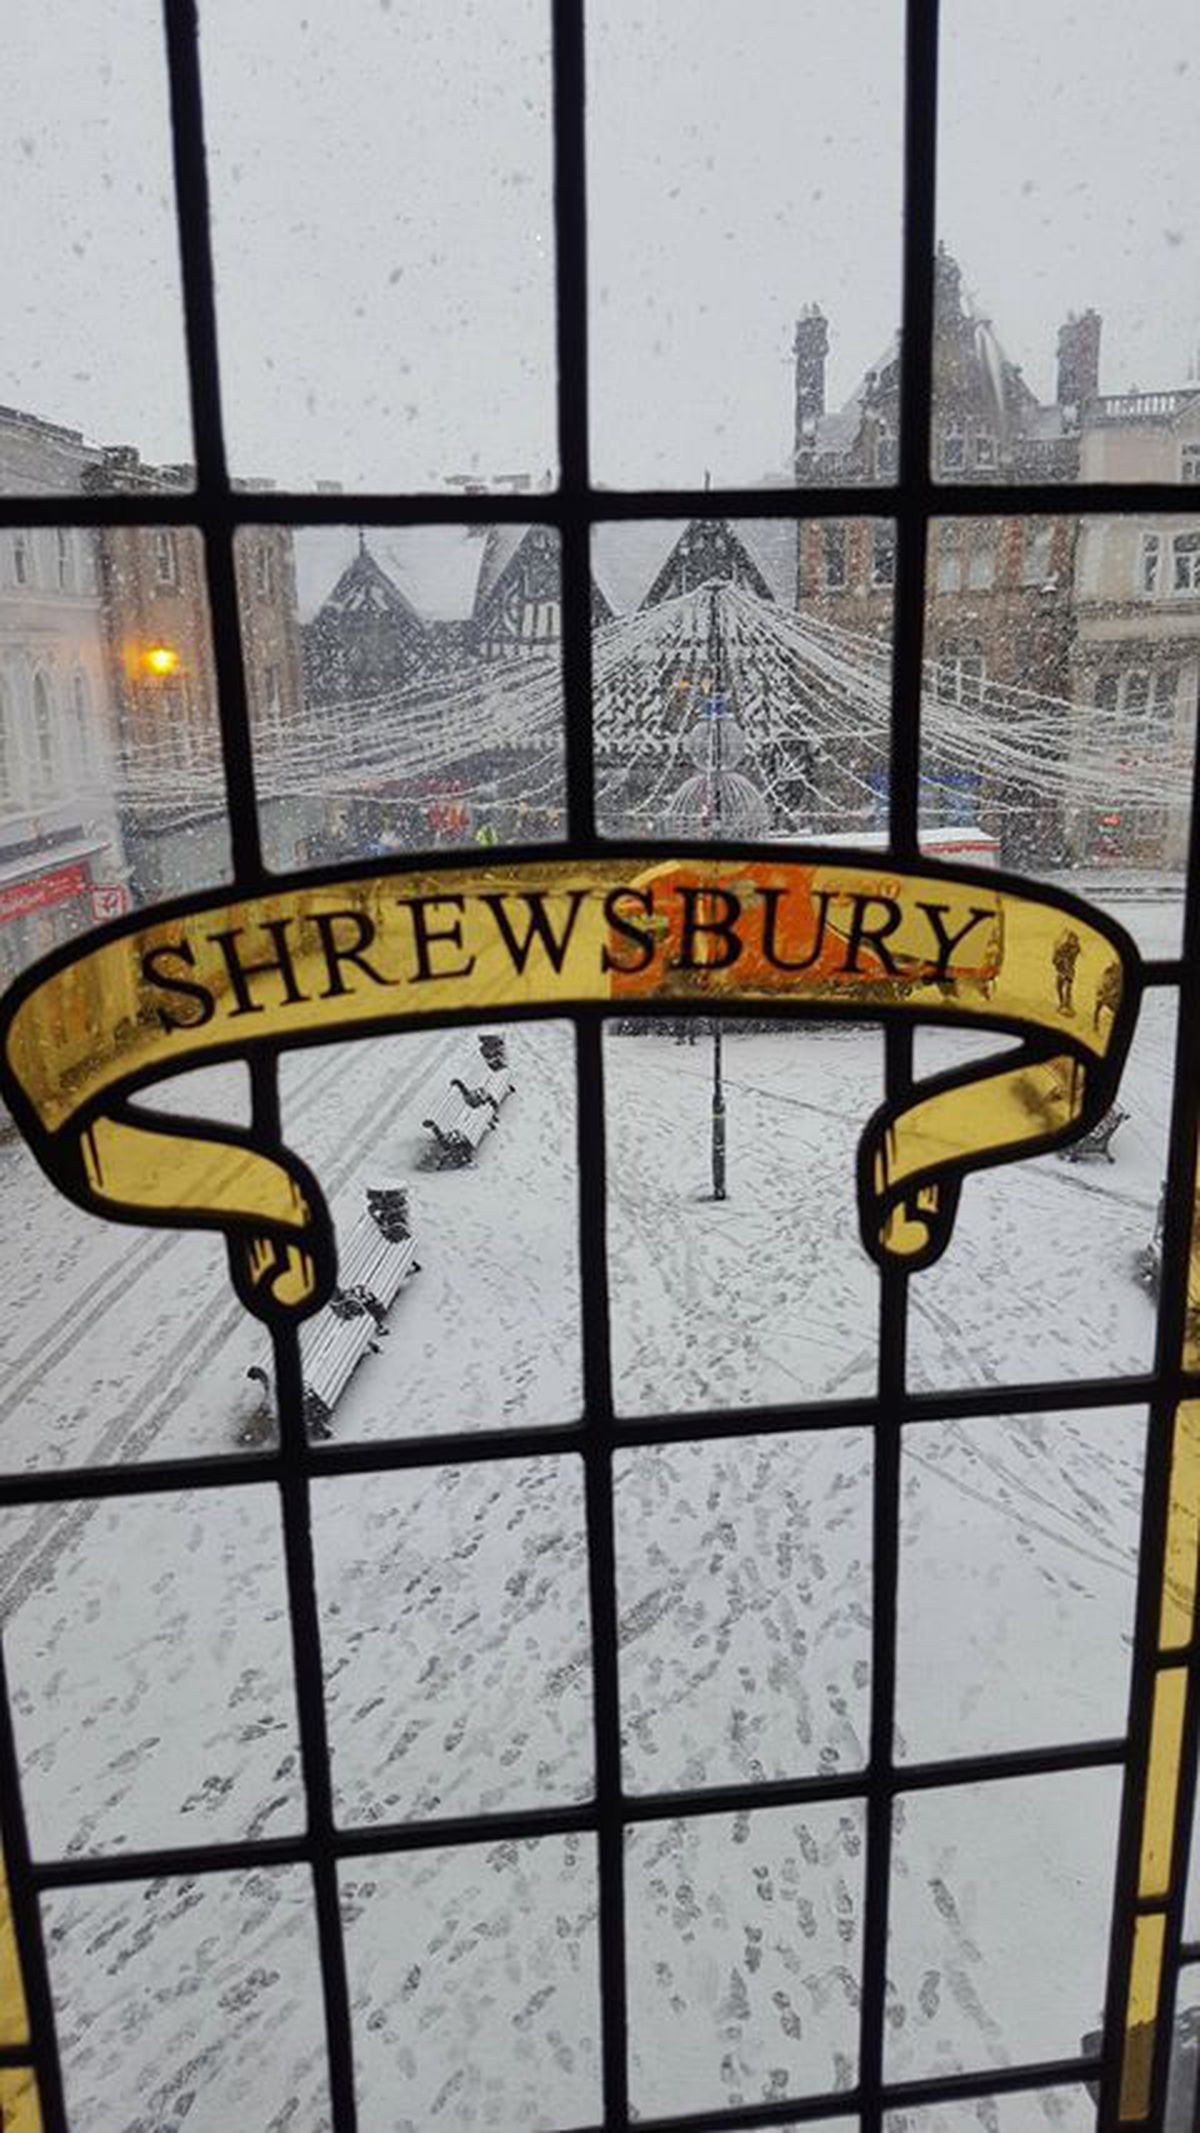 Snow in The Square, Shrewsbury. Photo: Oliver Turner